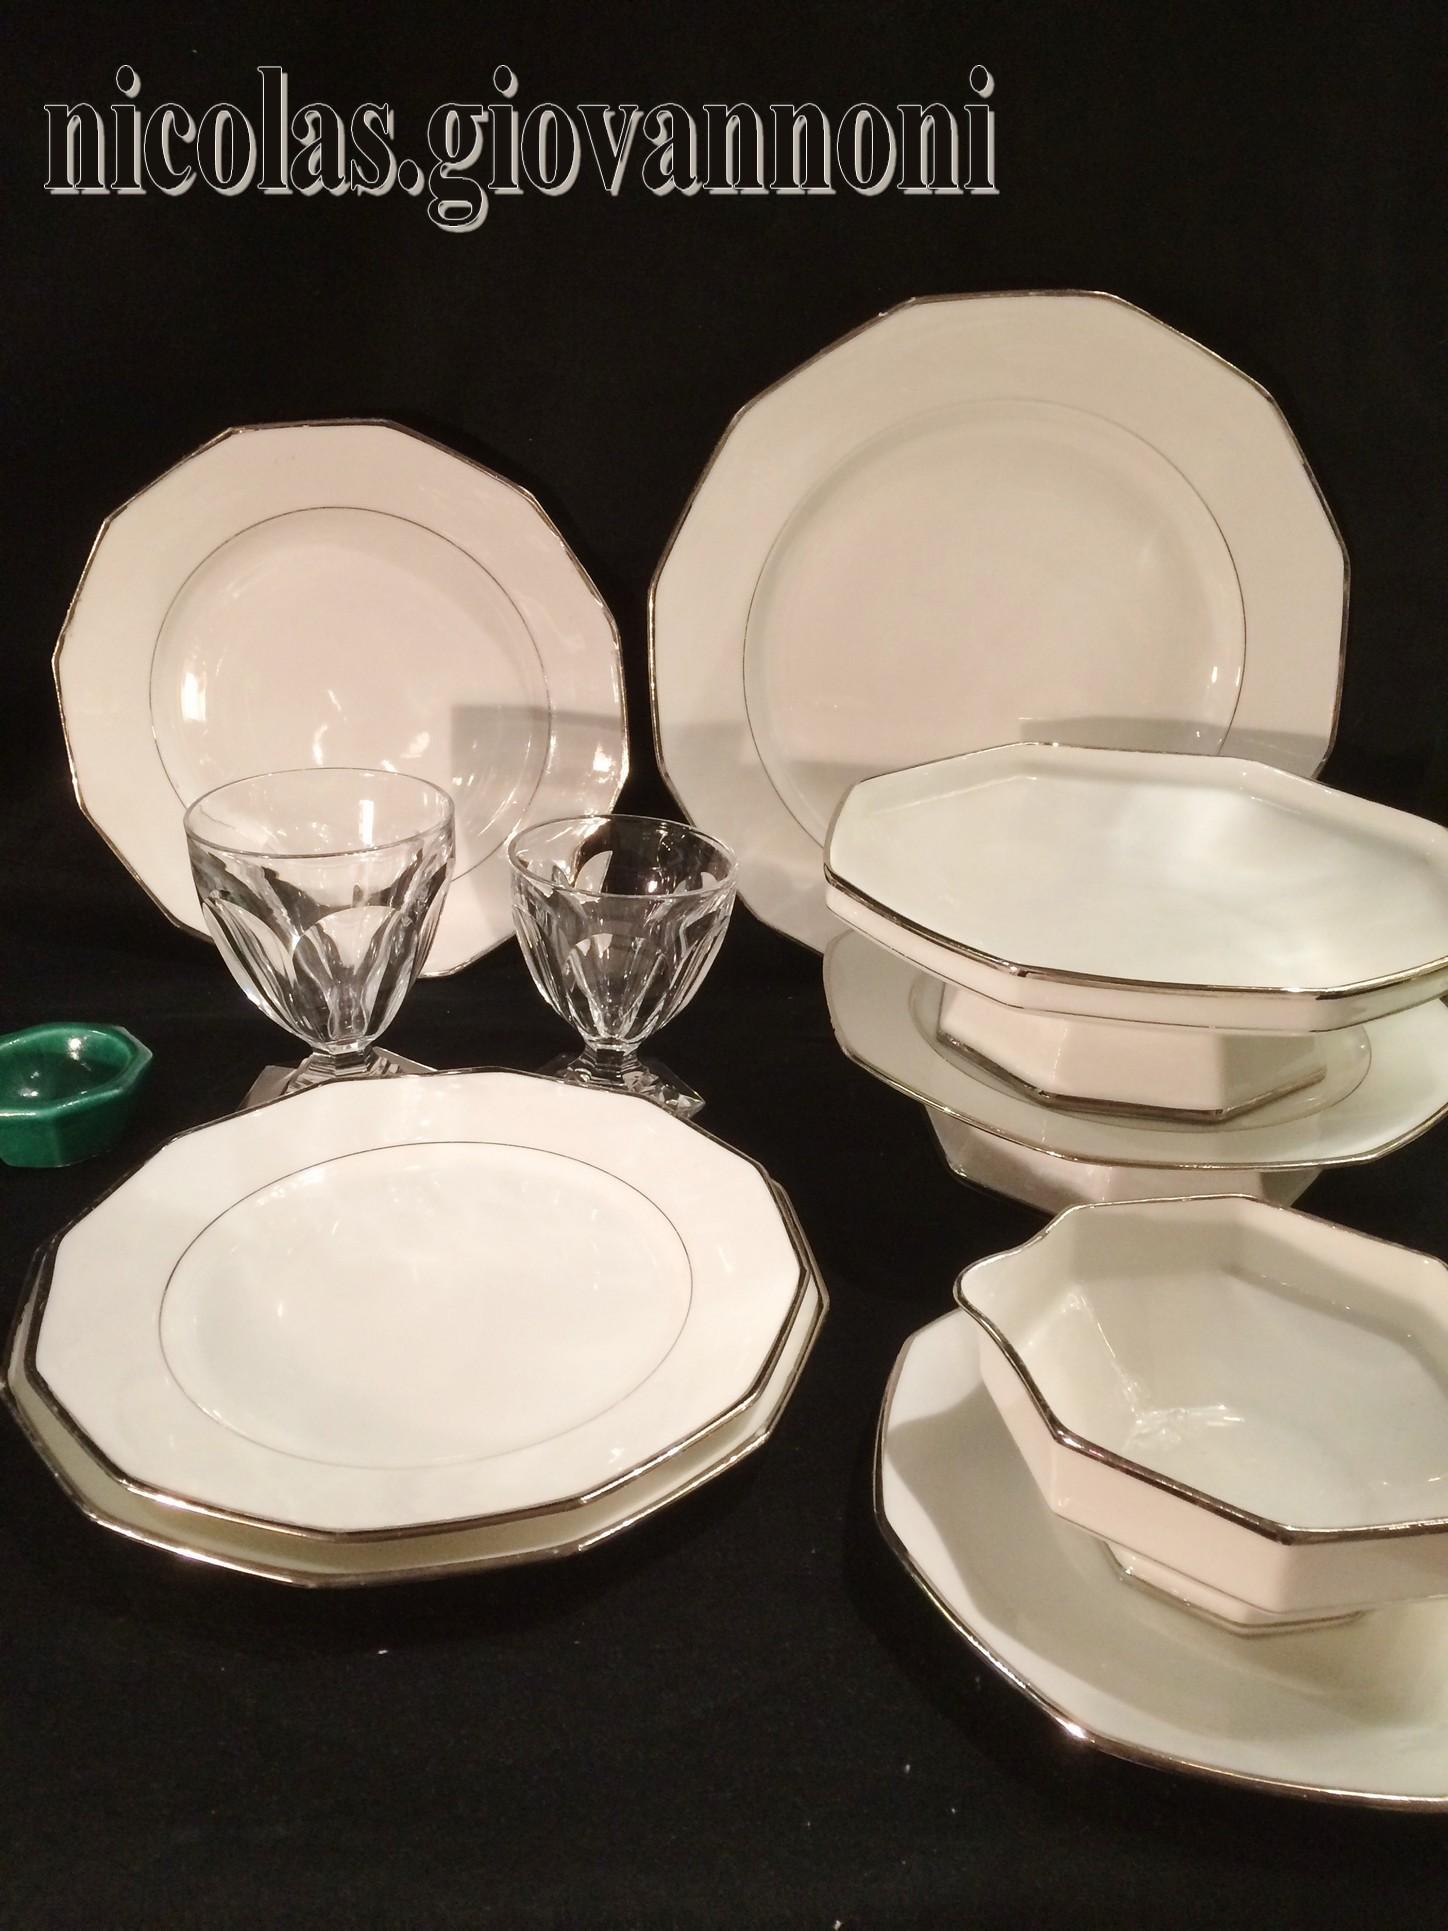 service 52 pi ces filet platine legrand limoges porcelaine catalogue cristal de. Black Bedroom Furniture Sets. Home Design Ideas